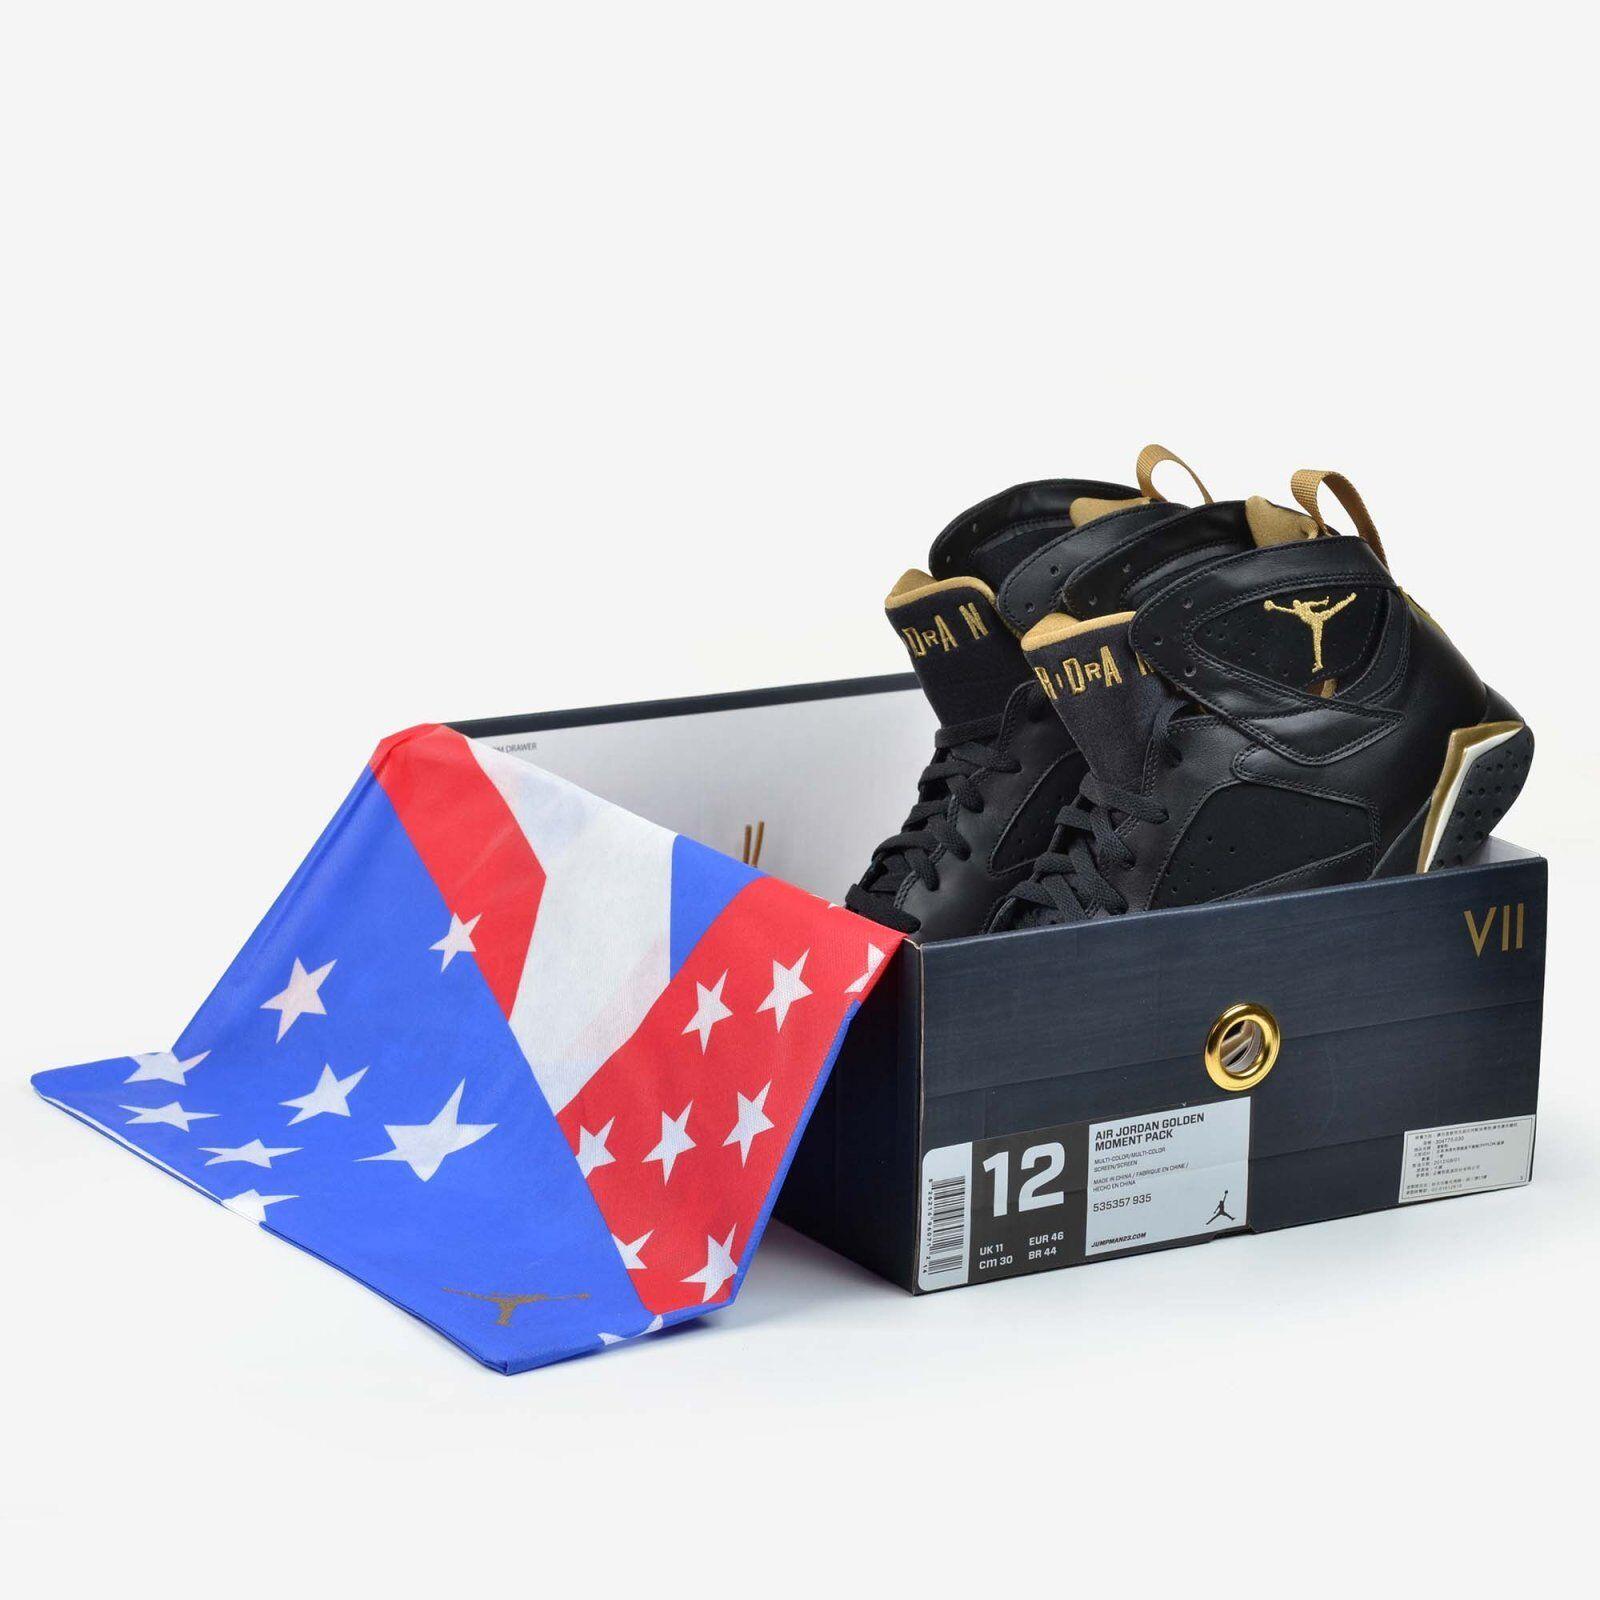 Air Jordan 7 Retro Black Gold Size 12 Golden Moment Pack 2018 GMP DS 304775-003